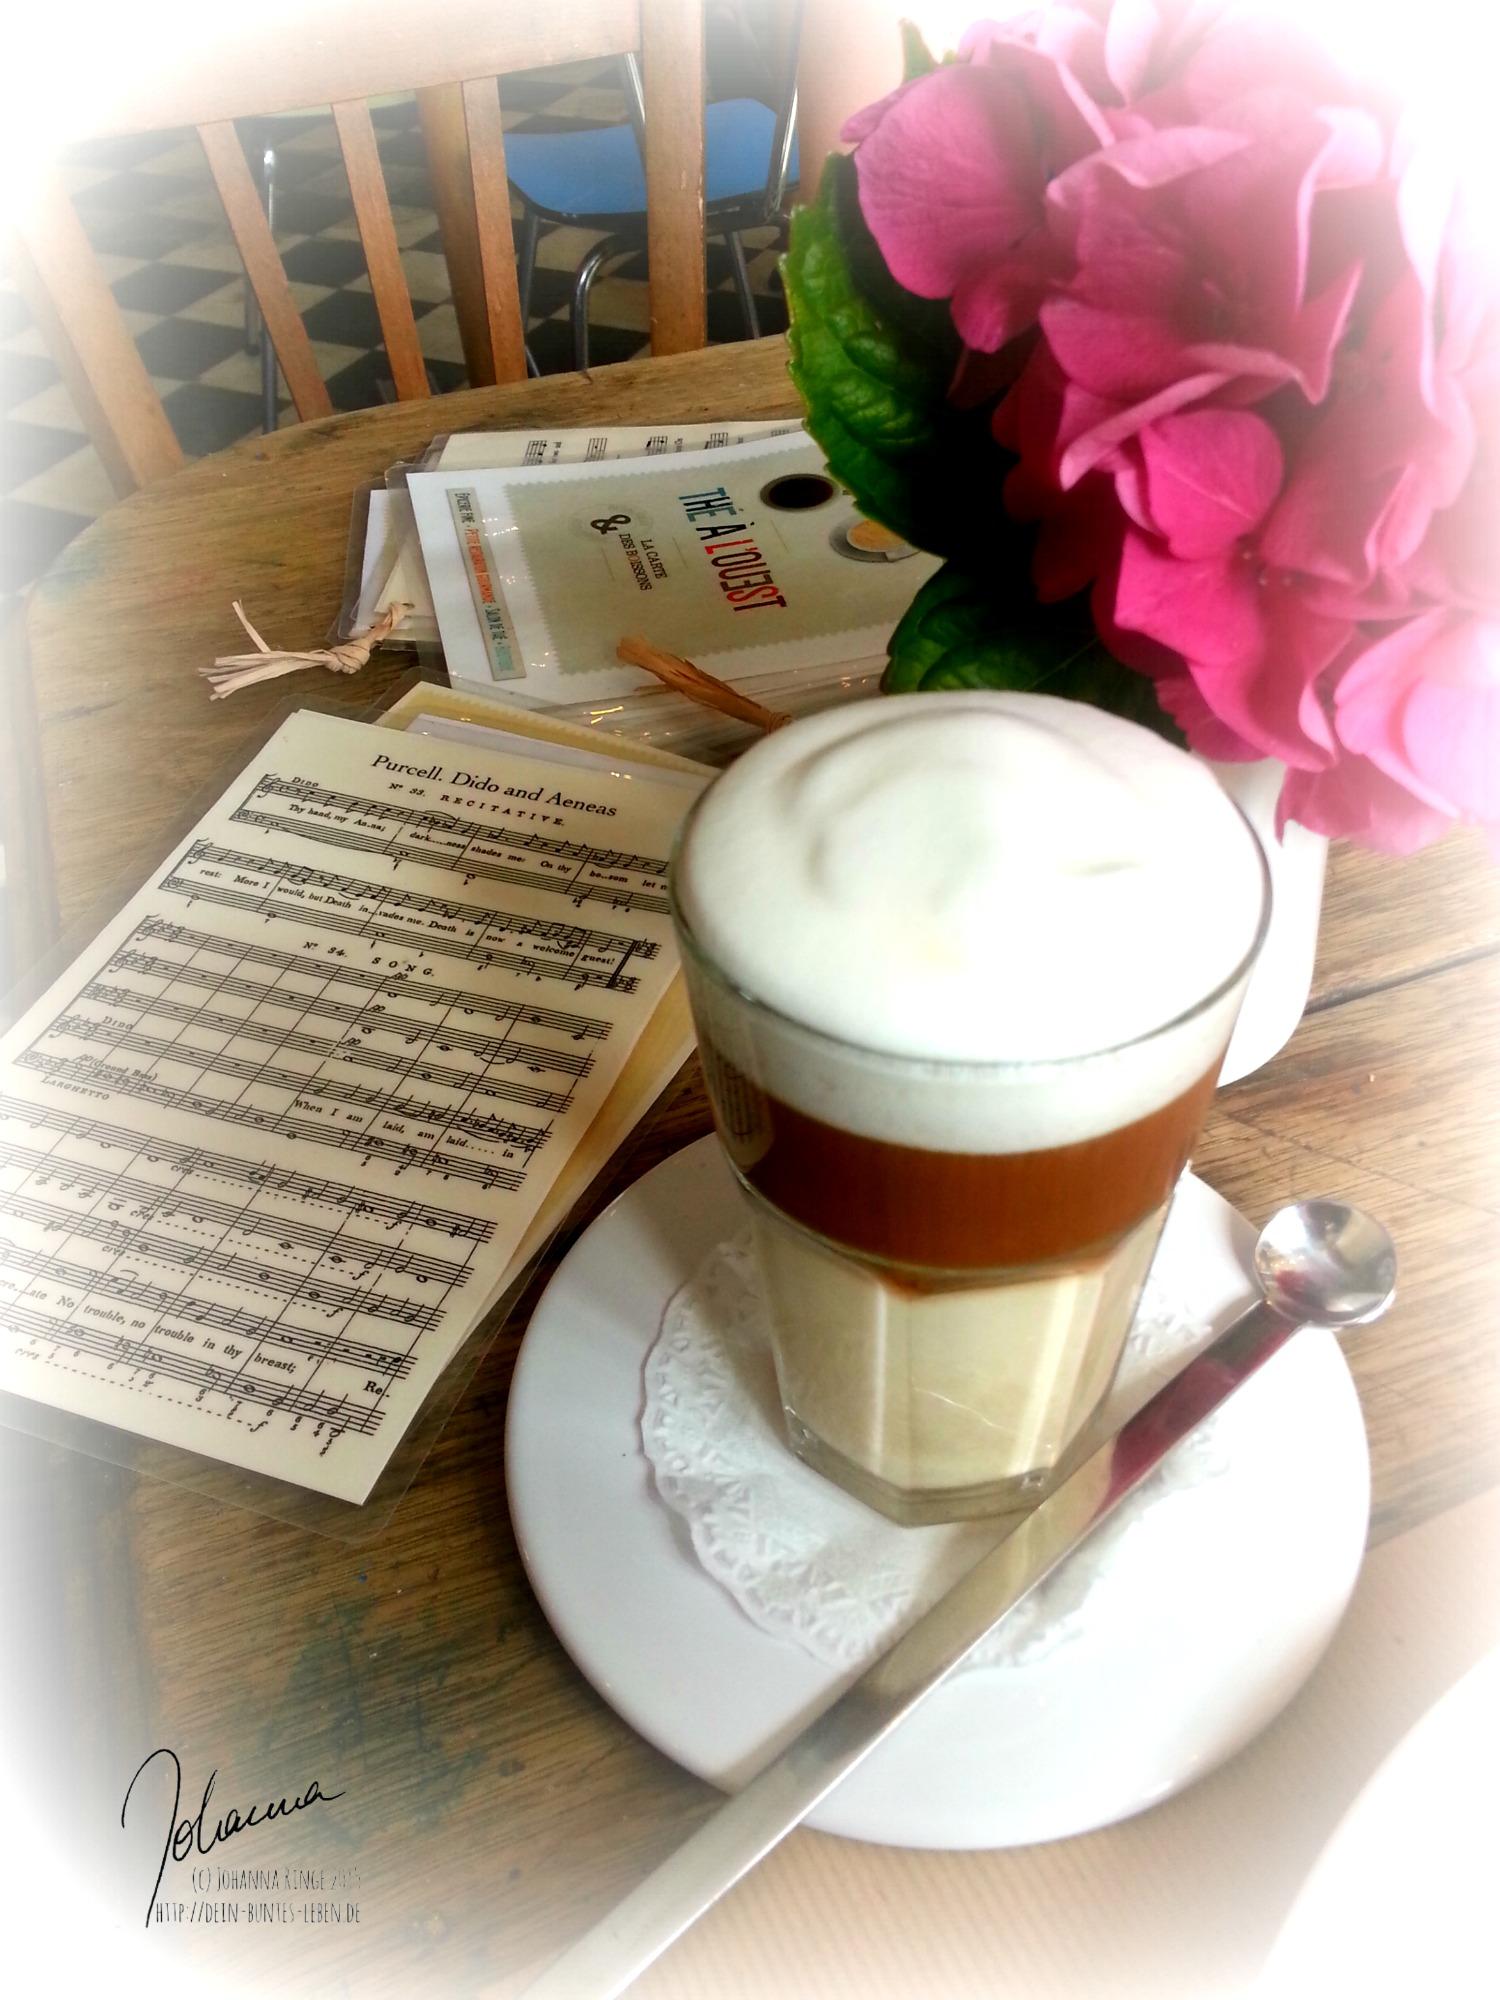 Im Café mit mir (c) Johanna Ringe